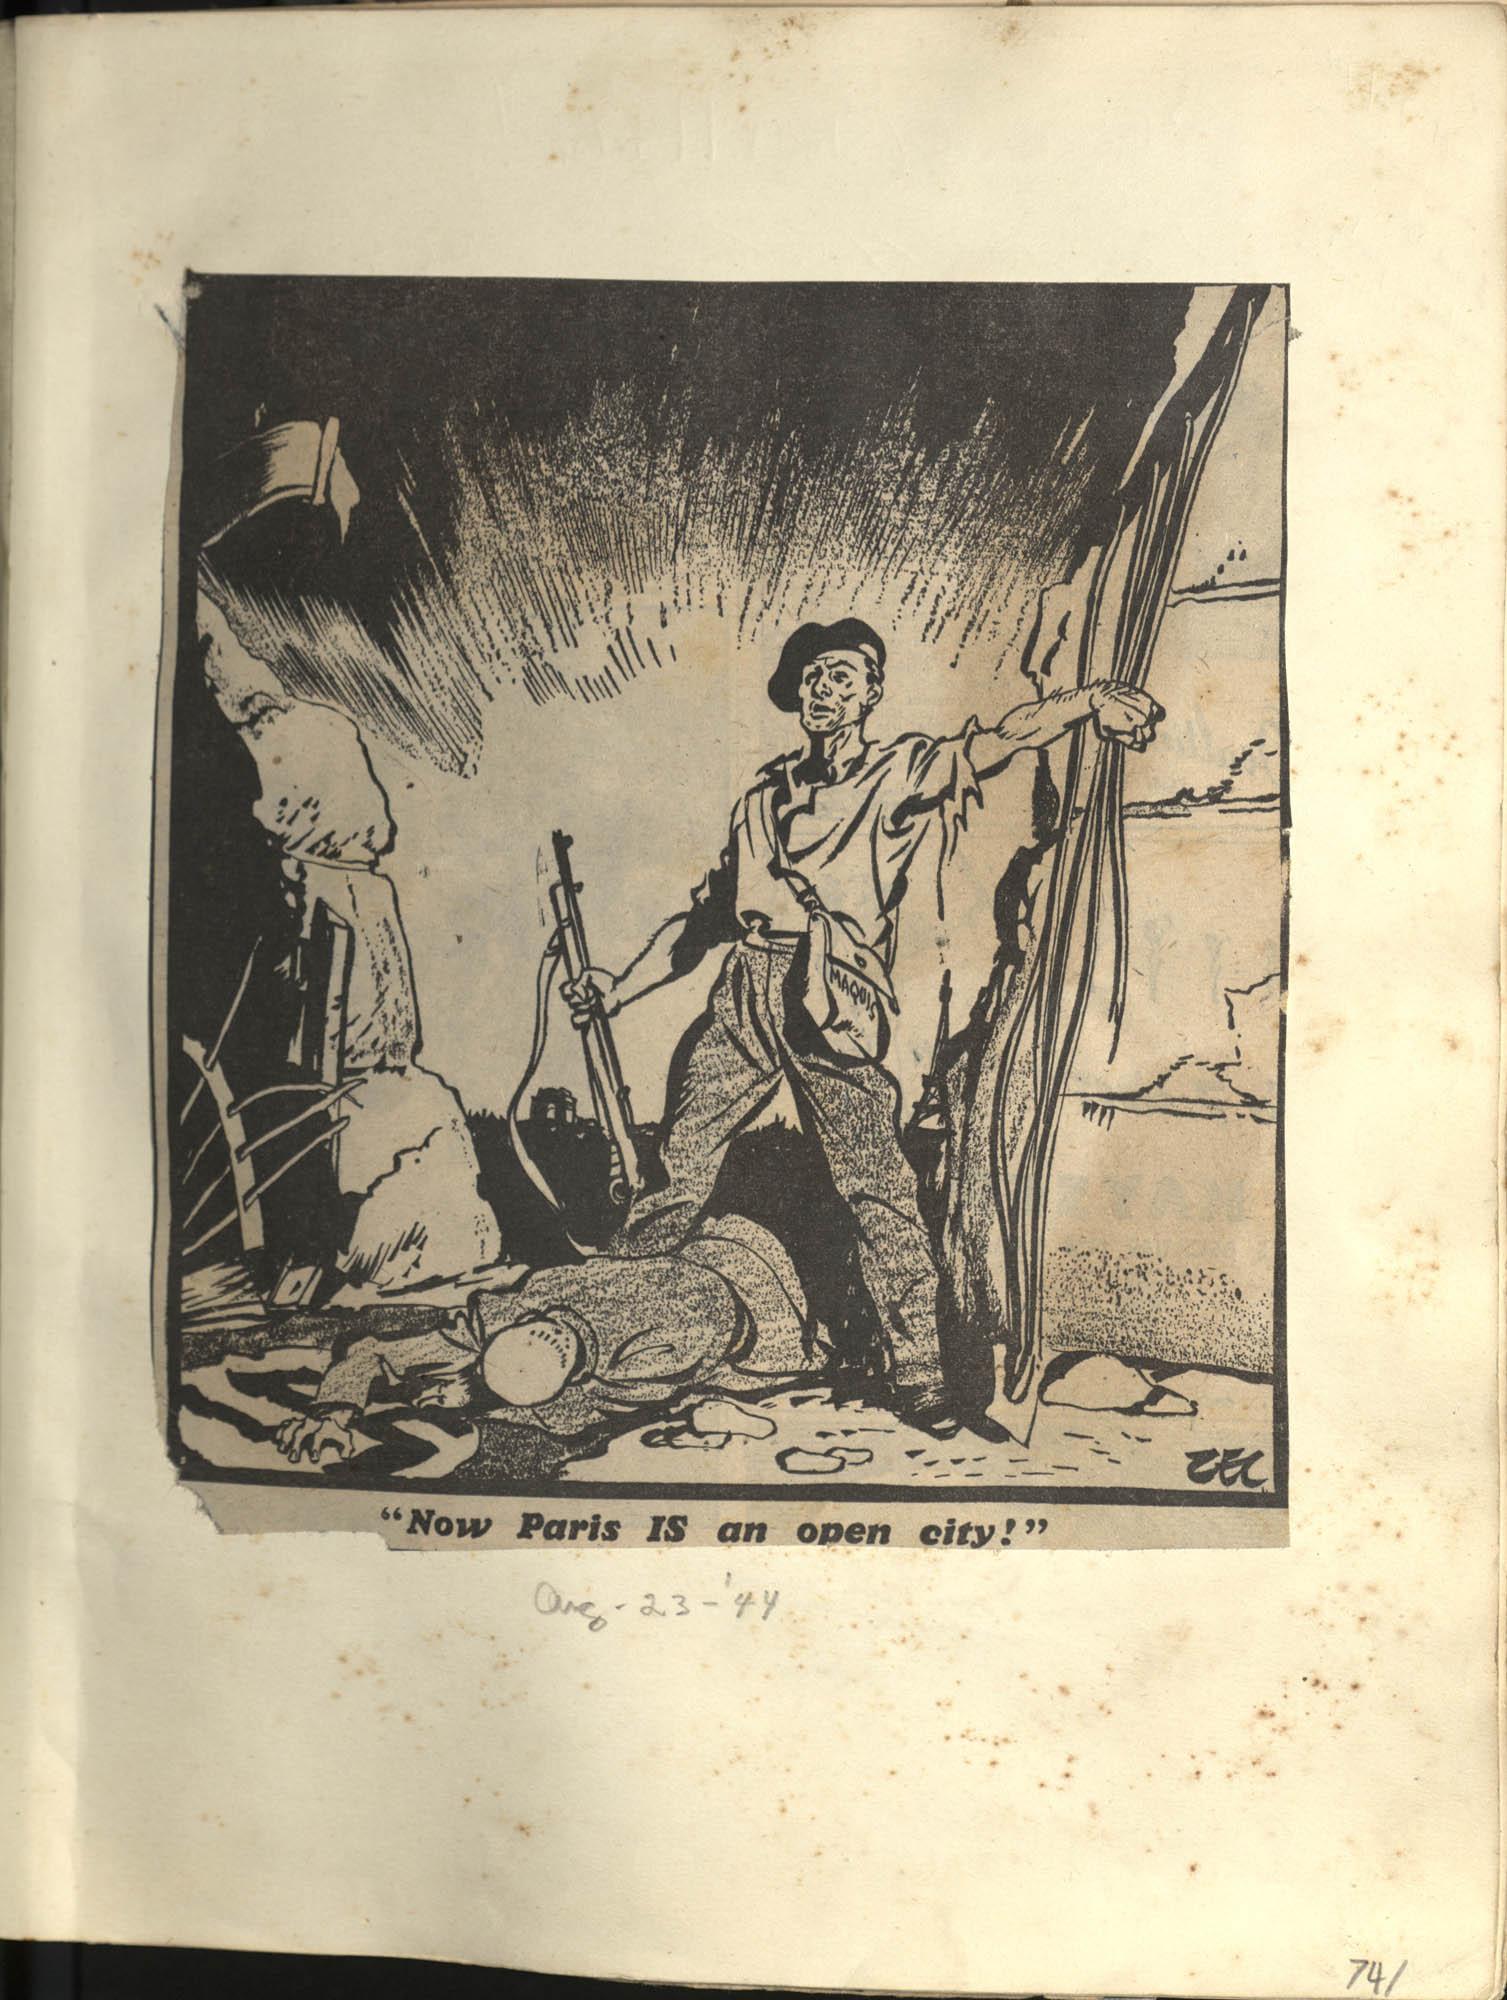 Gertrude Legendre OSS Scrapbook, 1944, Page 74